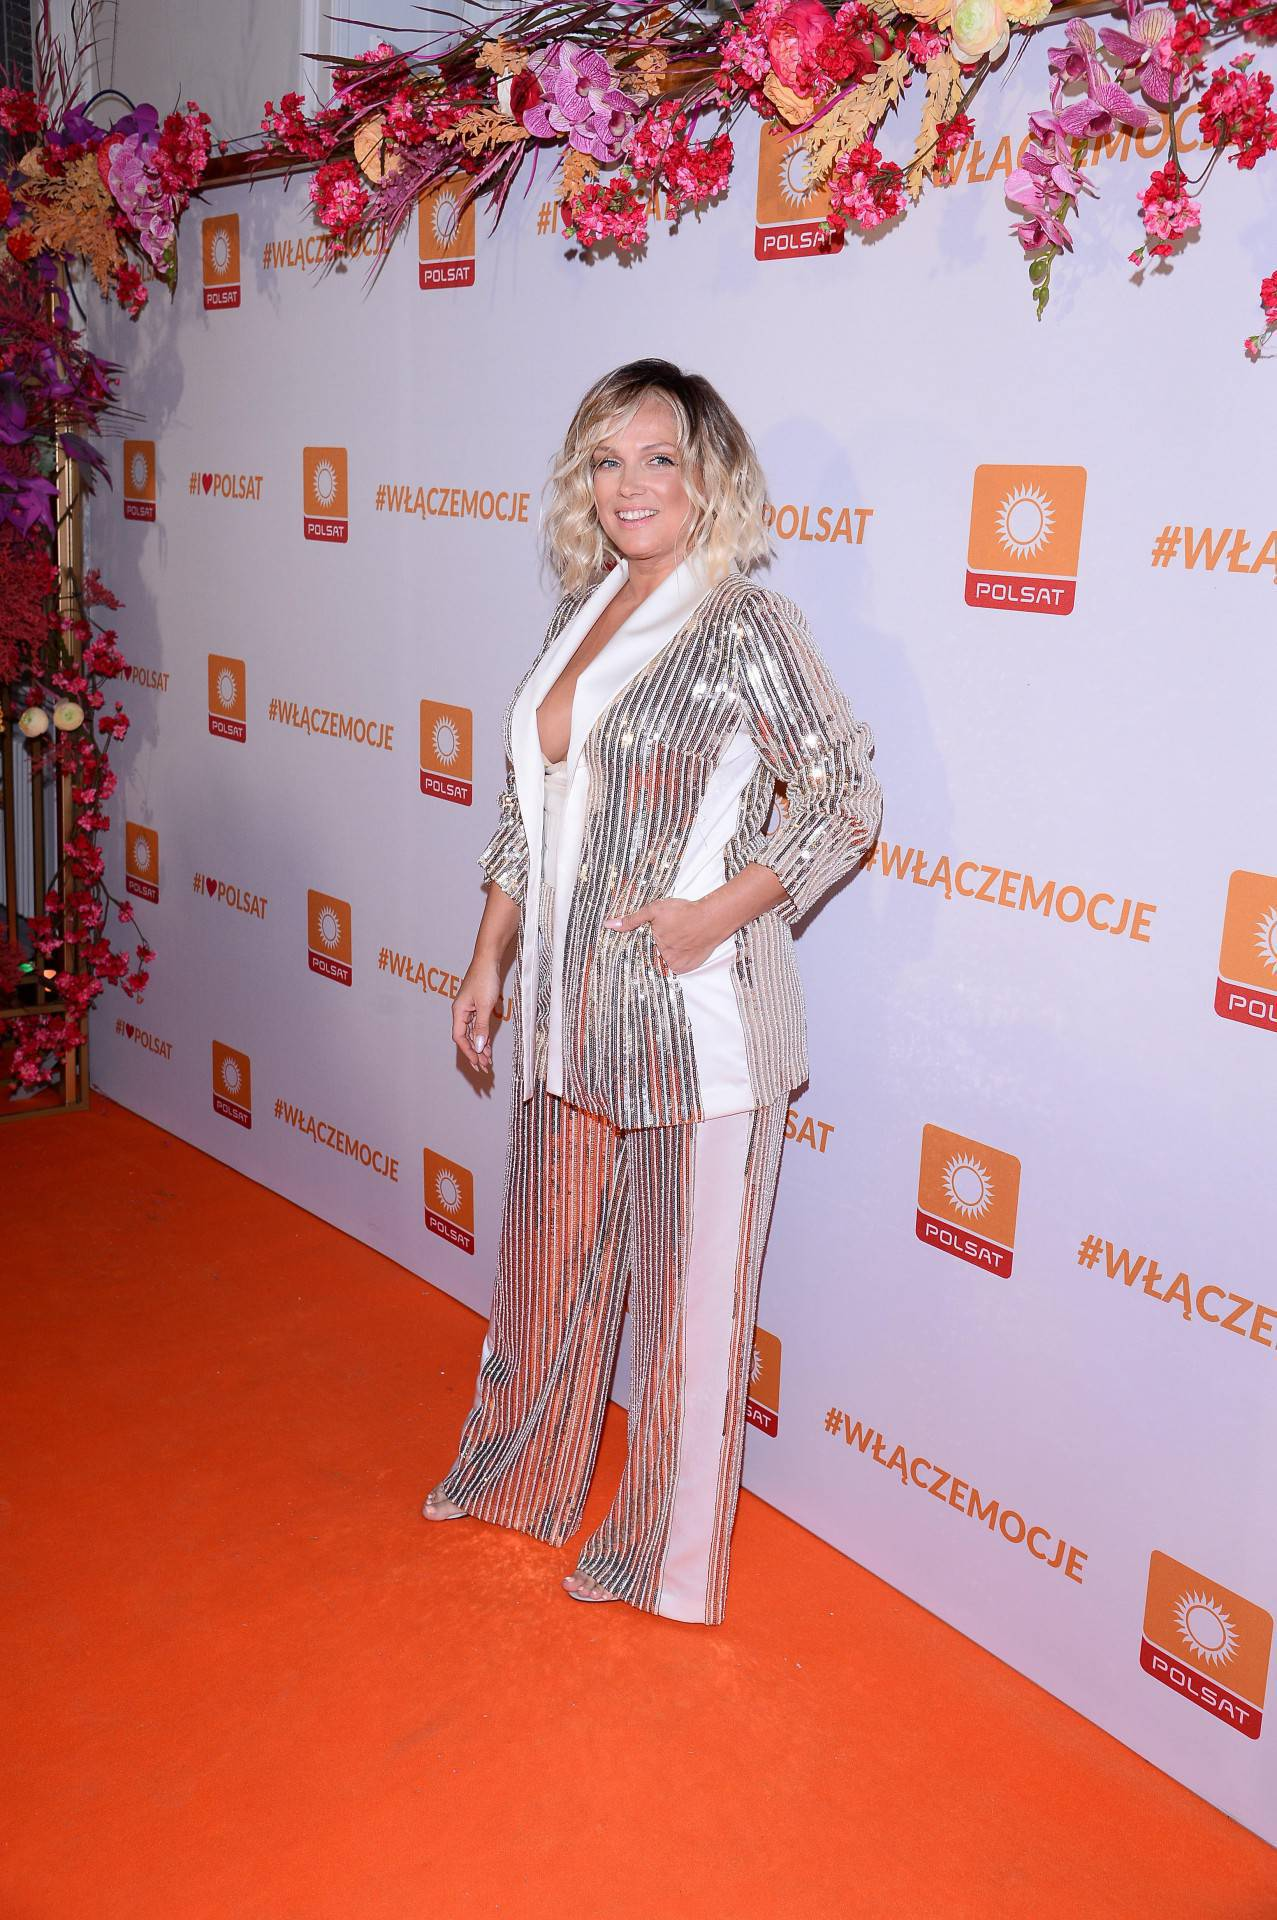 Joanna Liszowska – Polsat, wiosenna ramówka 2020